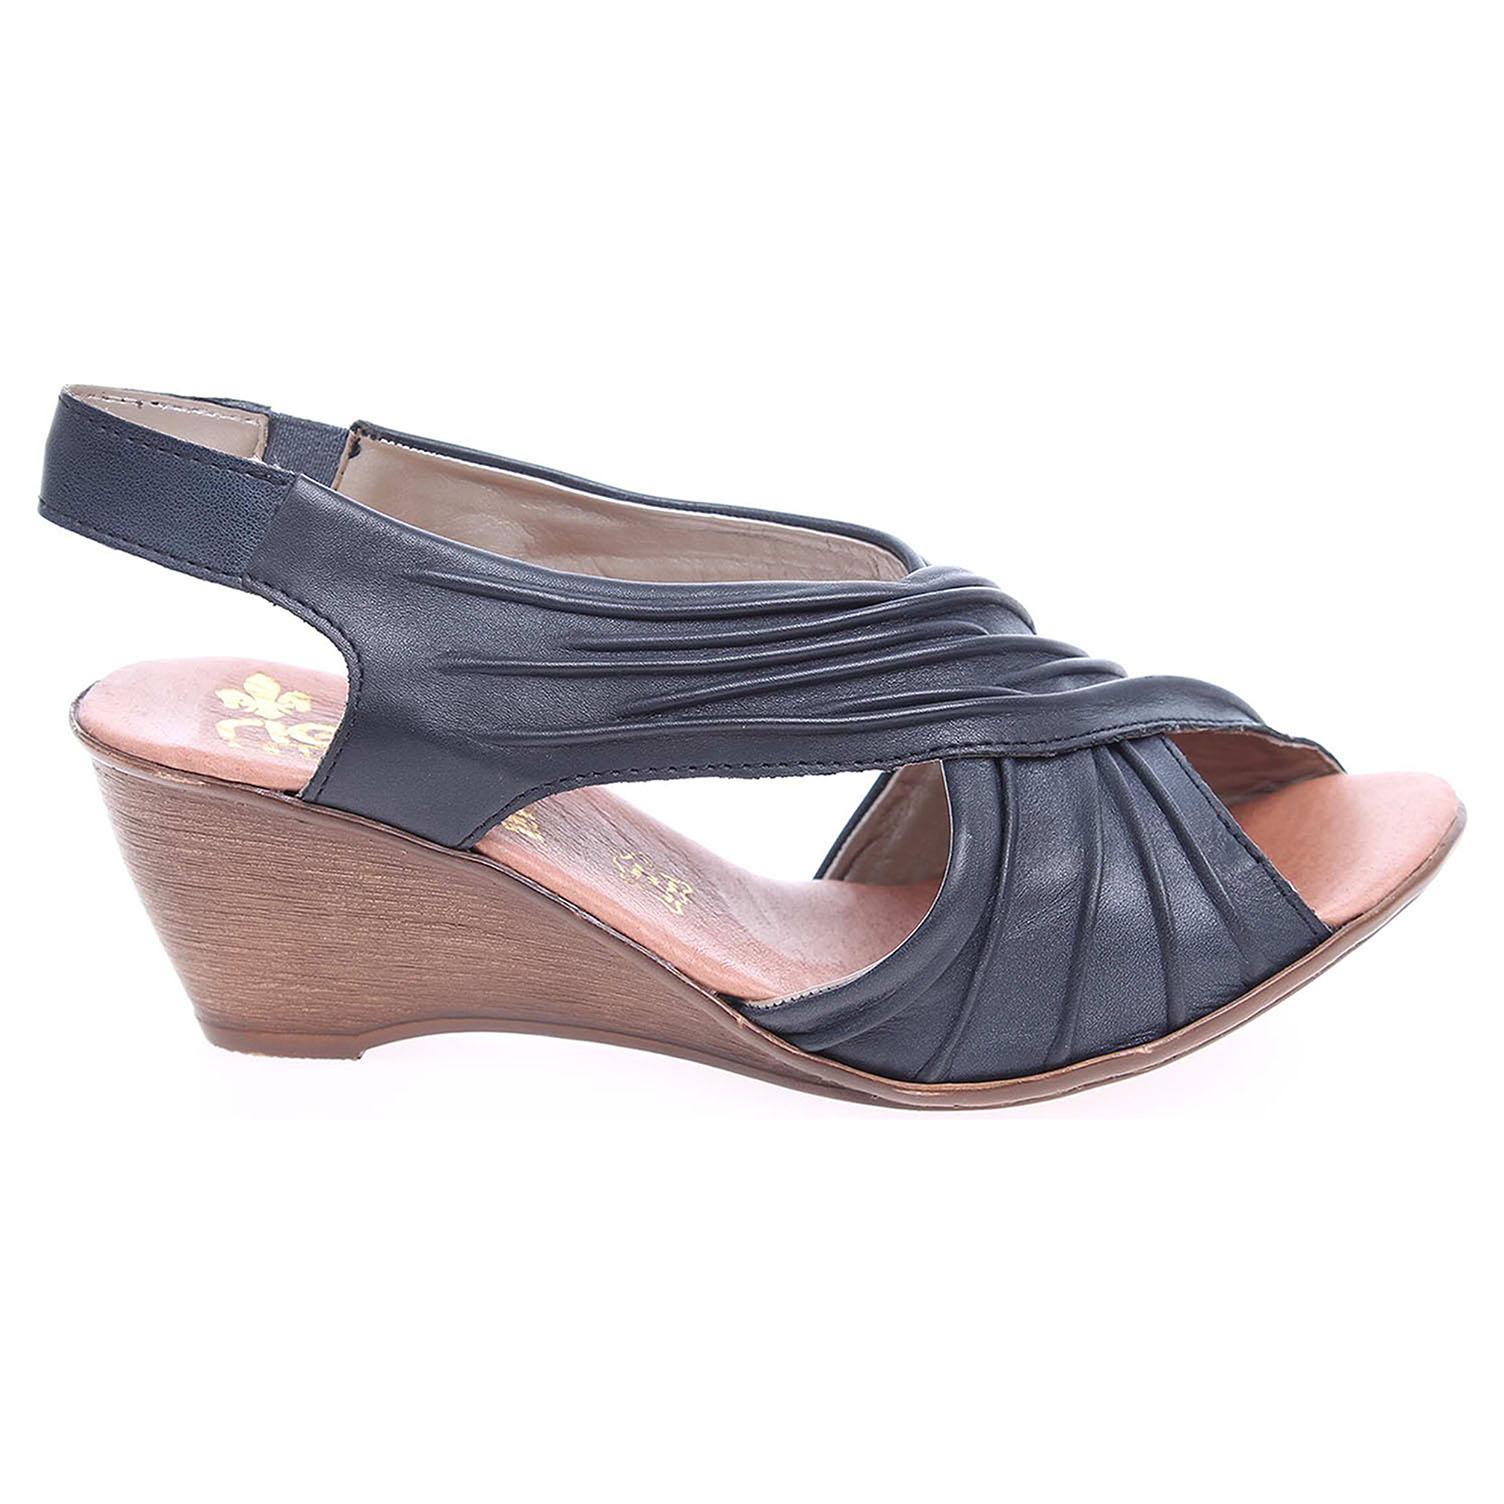 62dcd5094f4d8 Rieker dámské sandály V1173-12 modré | REJNOK obuv